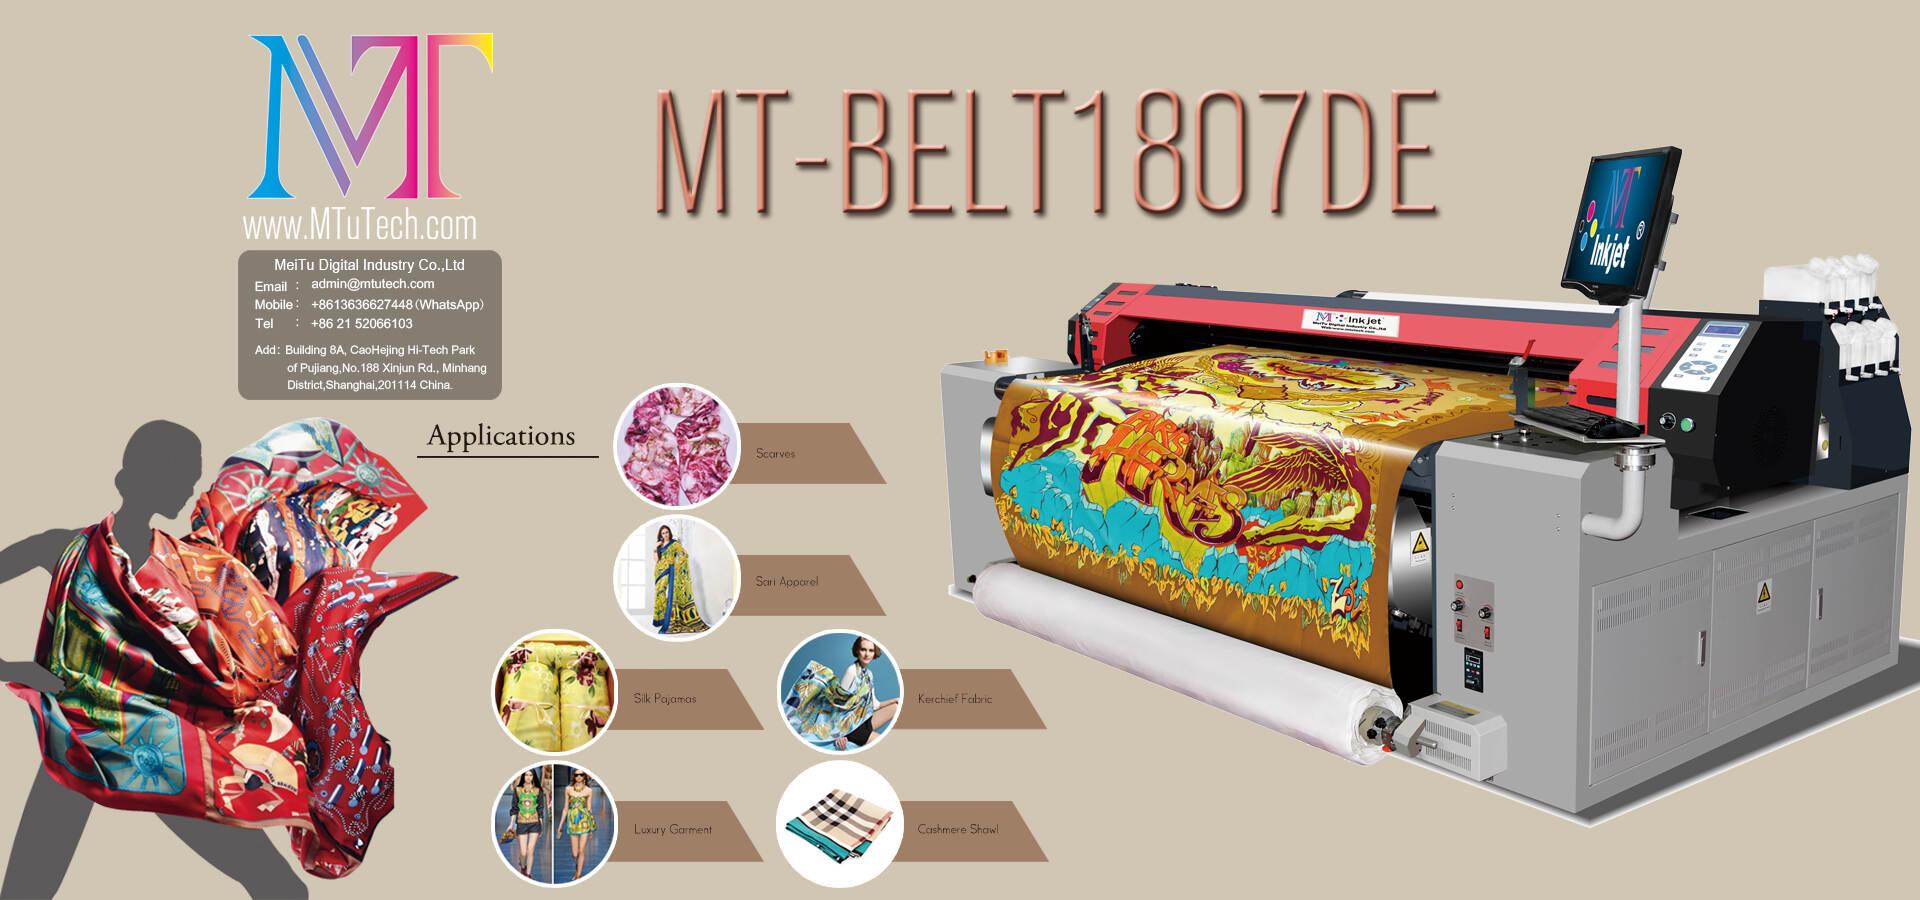 Digital Textile Natural Fiber Printer Supplier - MTuTech com